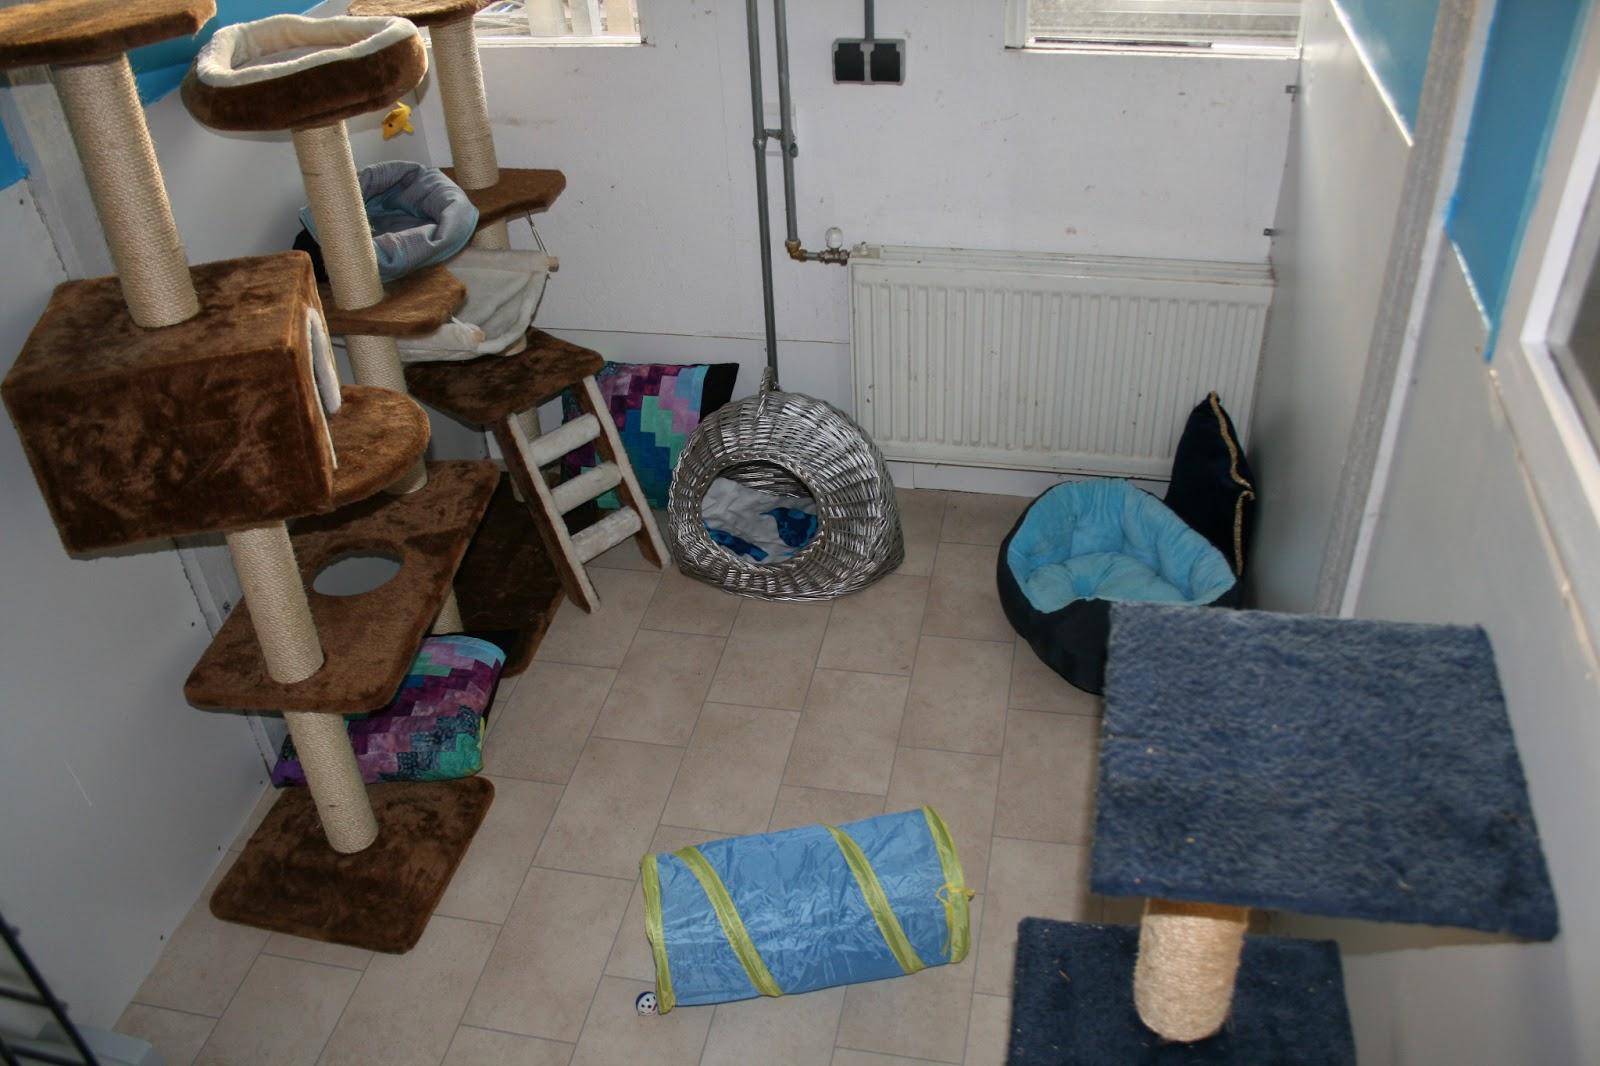 Muur blauwe keuken blauwe kamer kind obas